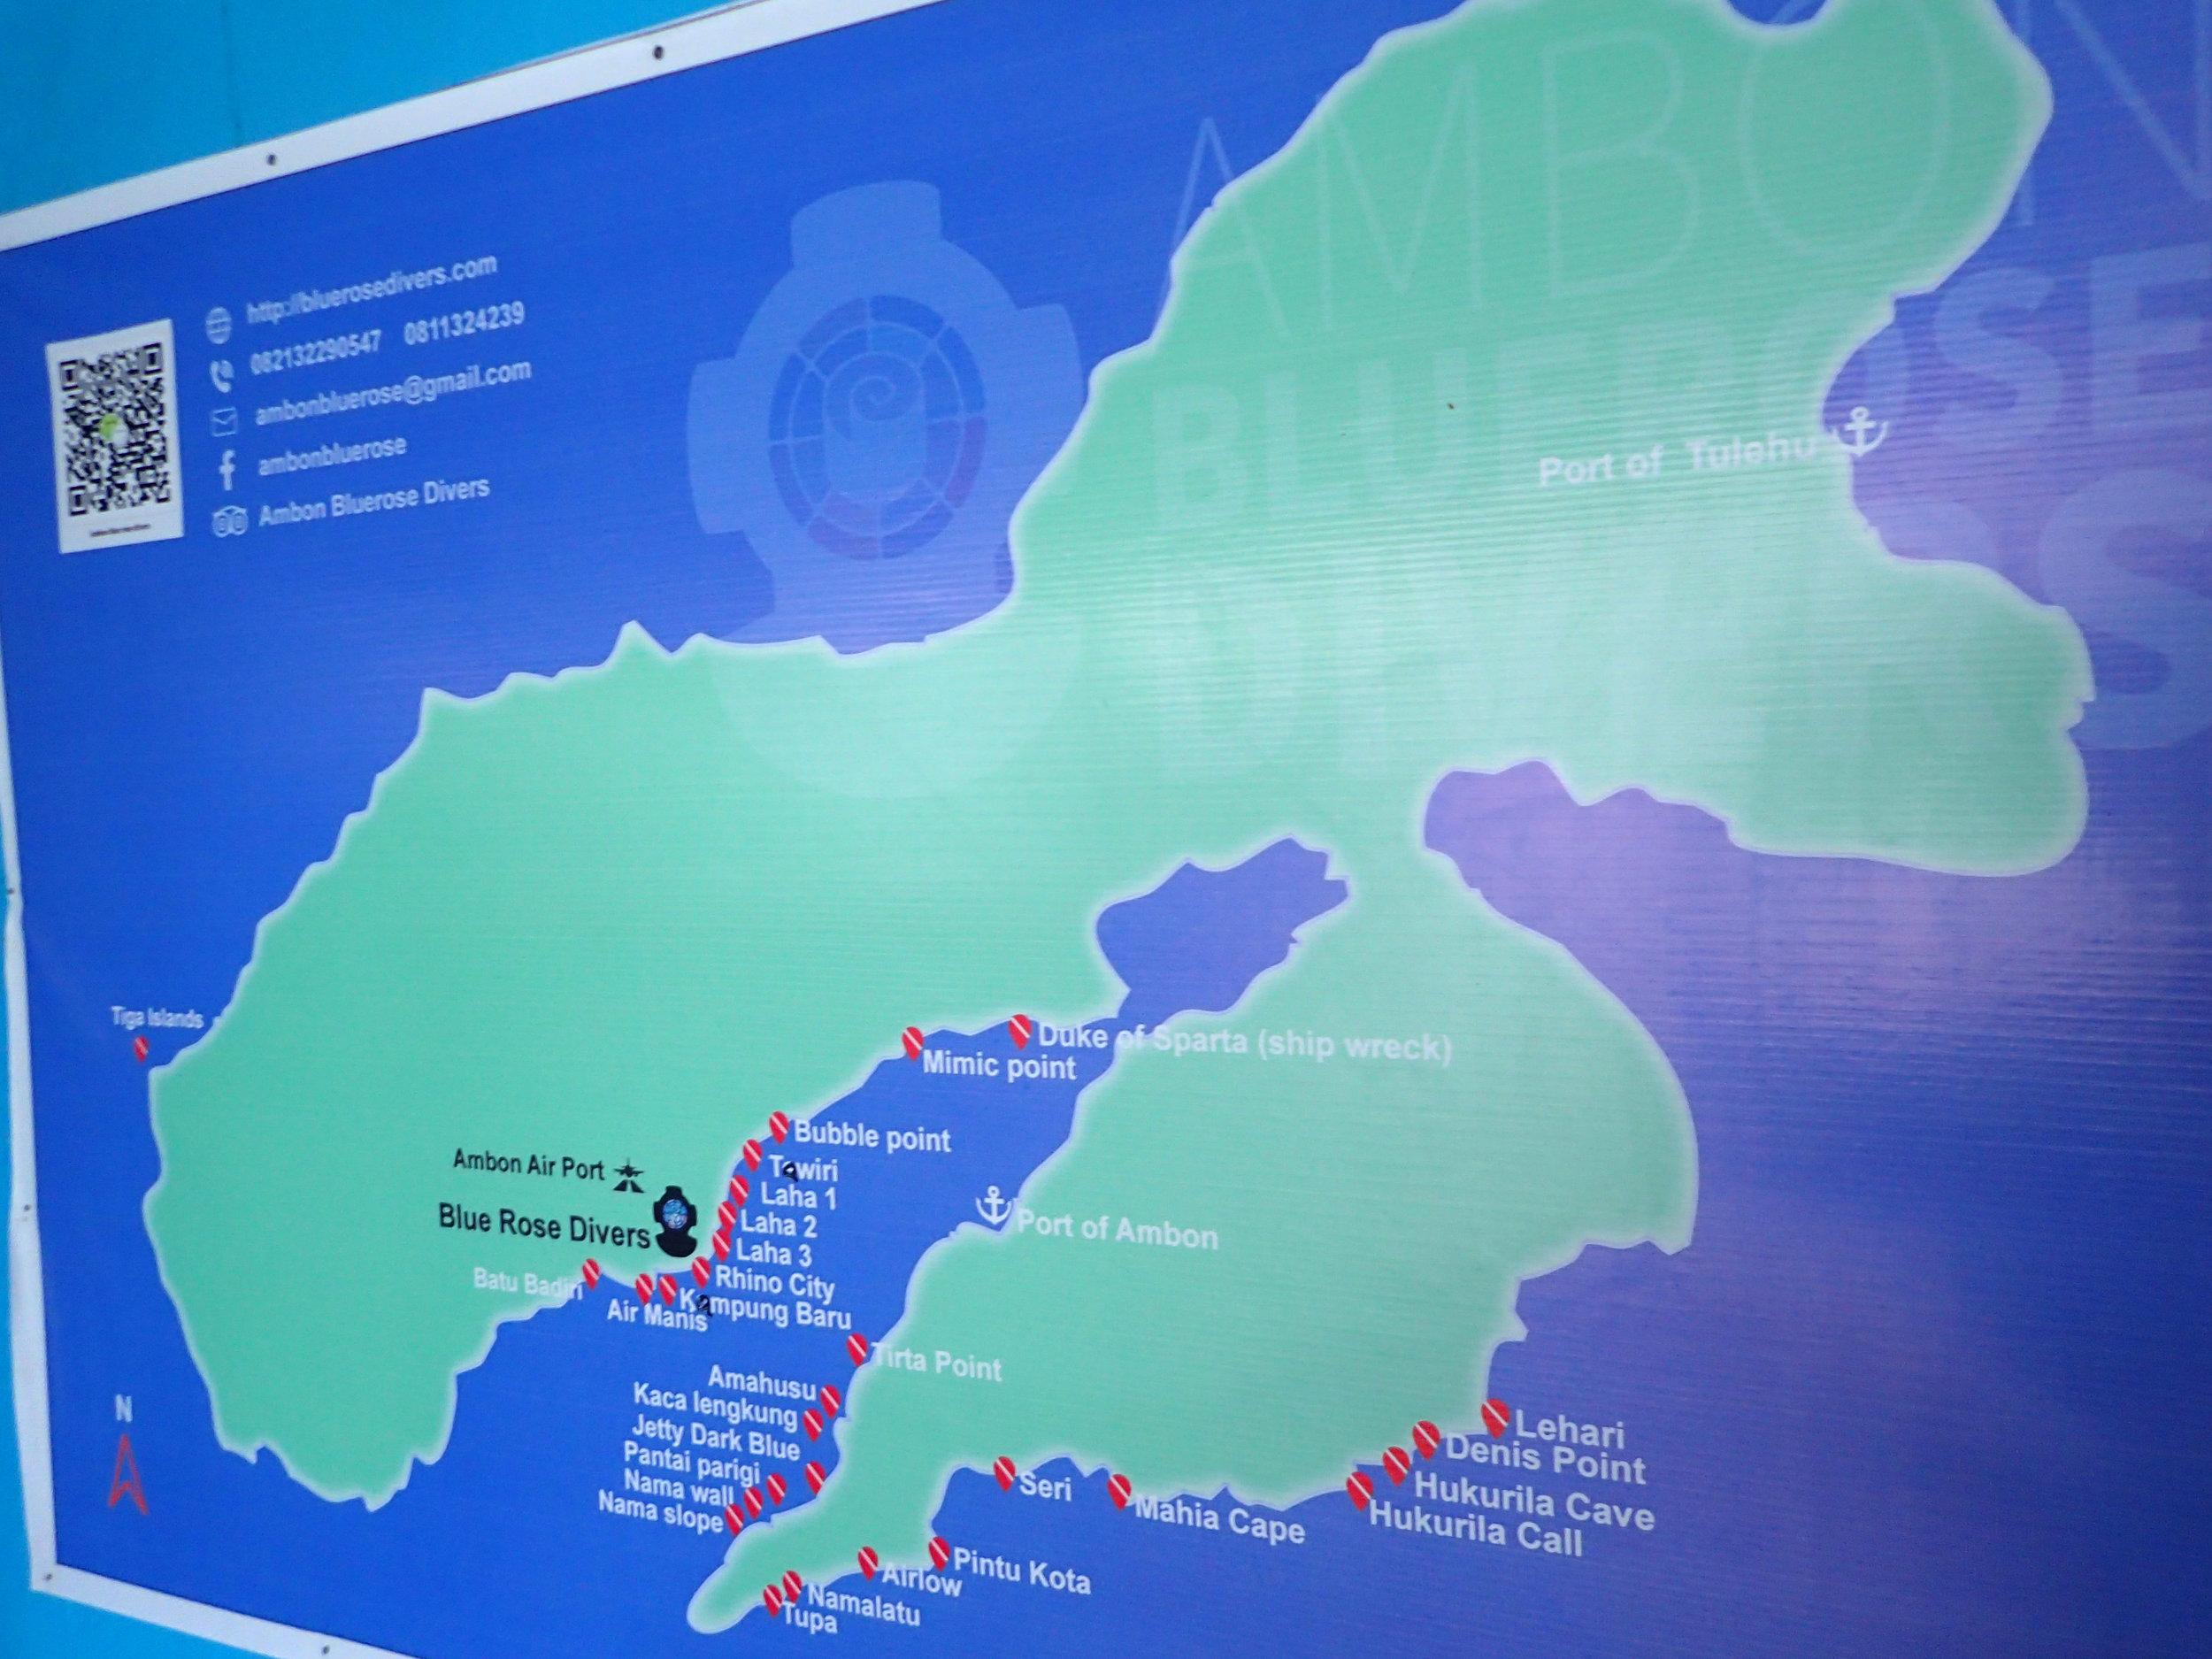 Ambon dive site map.jpg